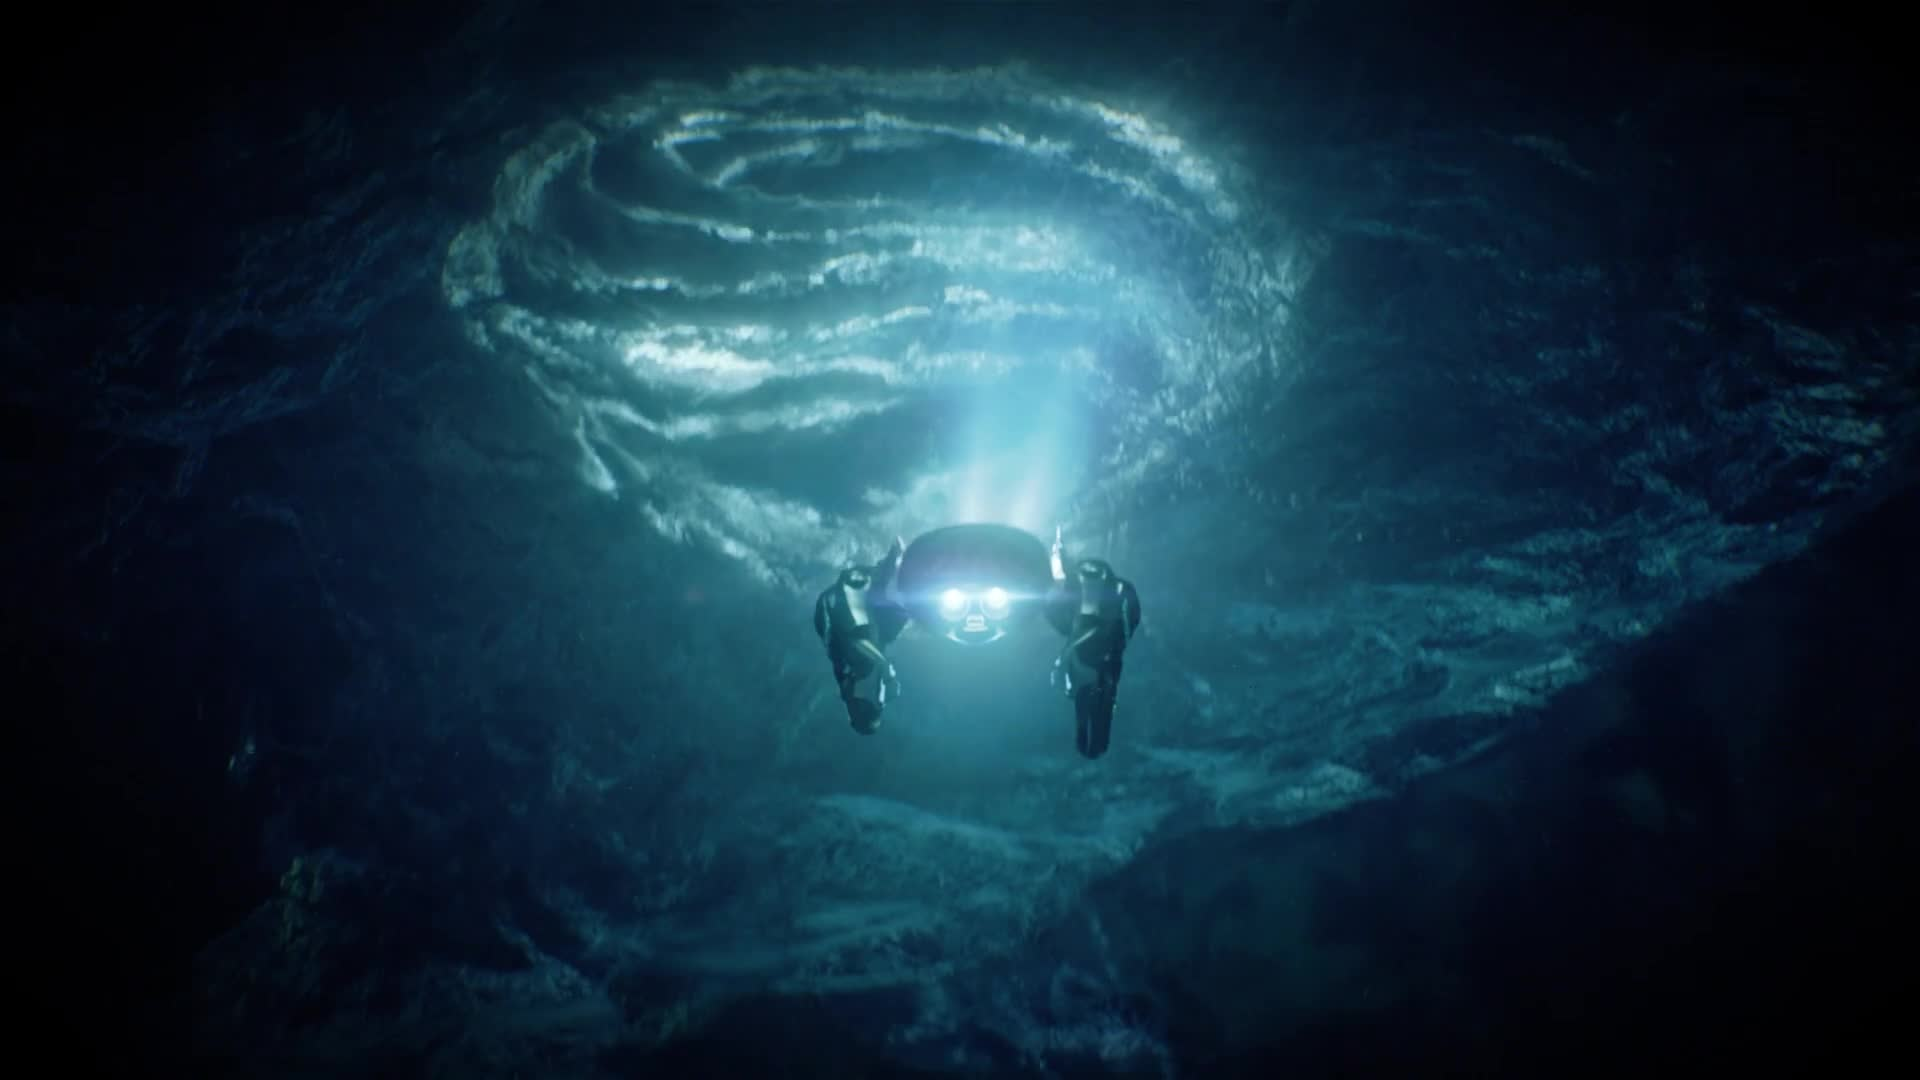 Krypton - Environment VFX GIFs